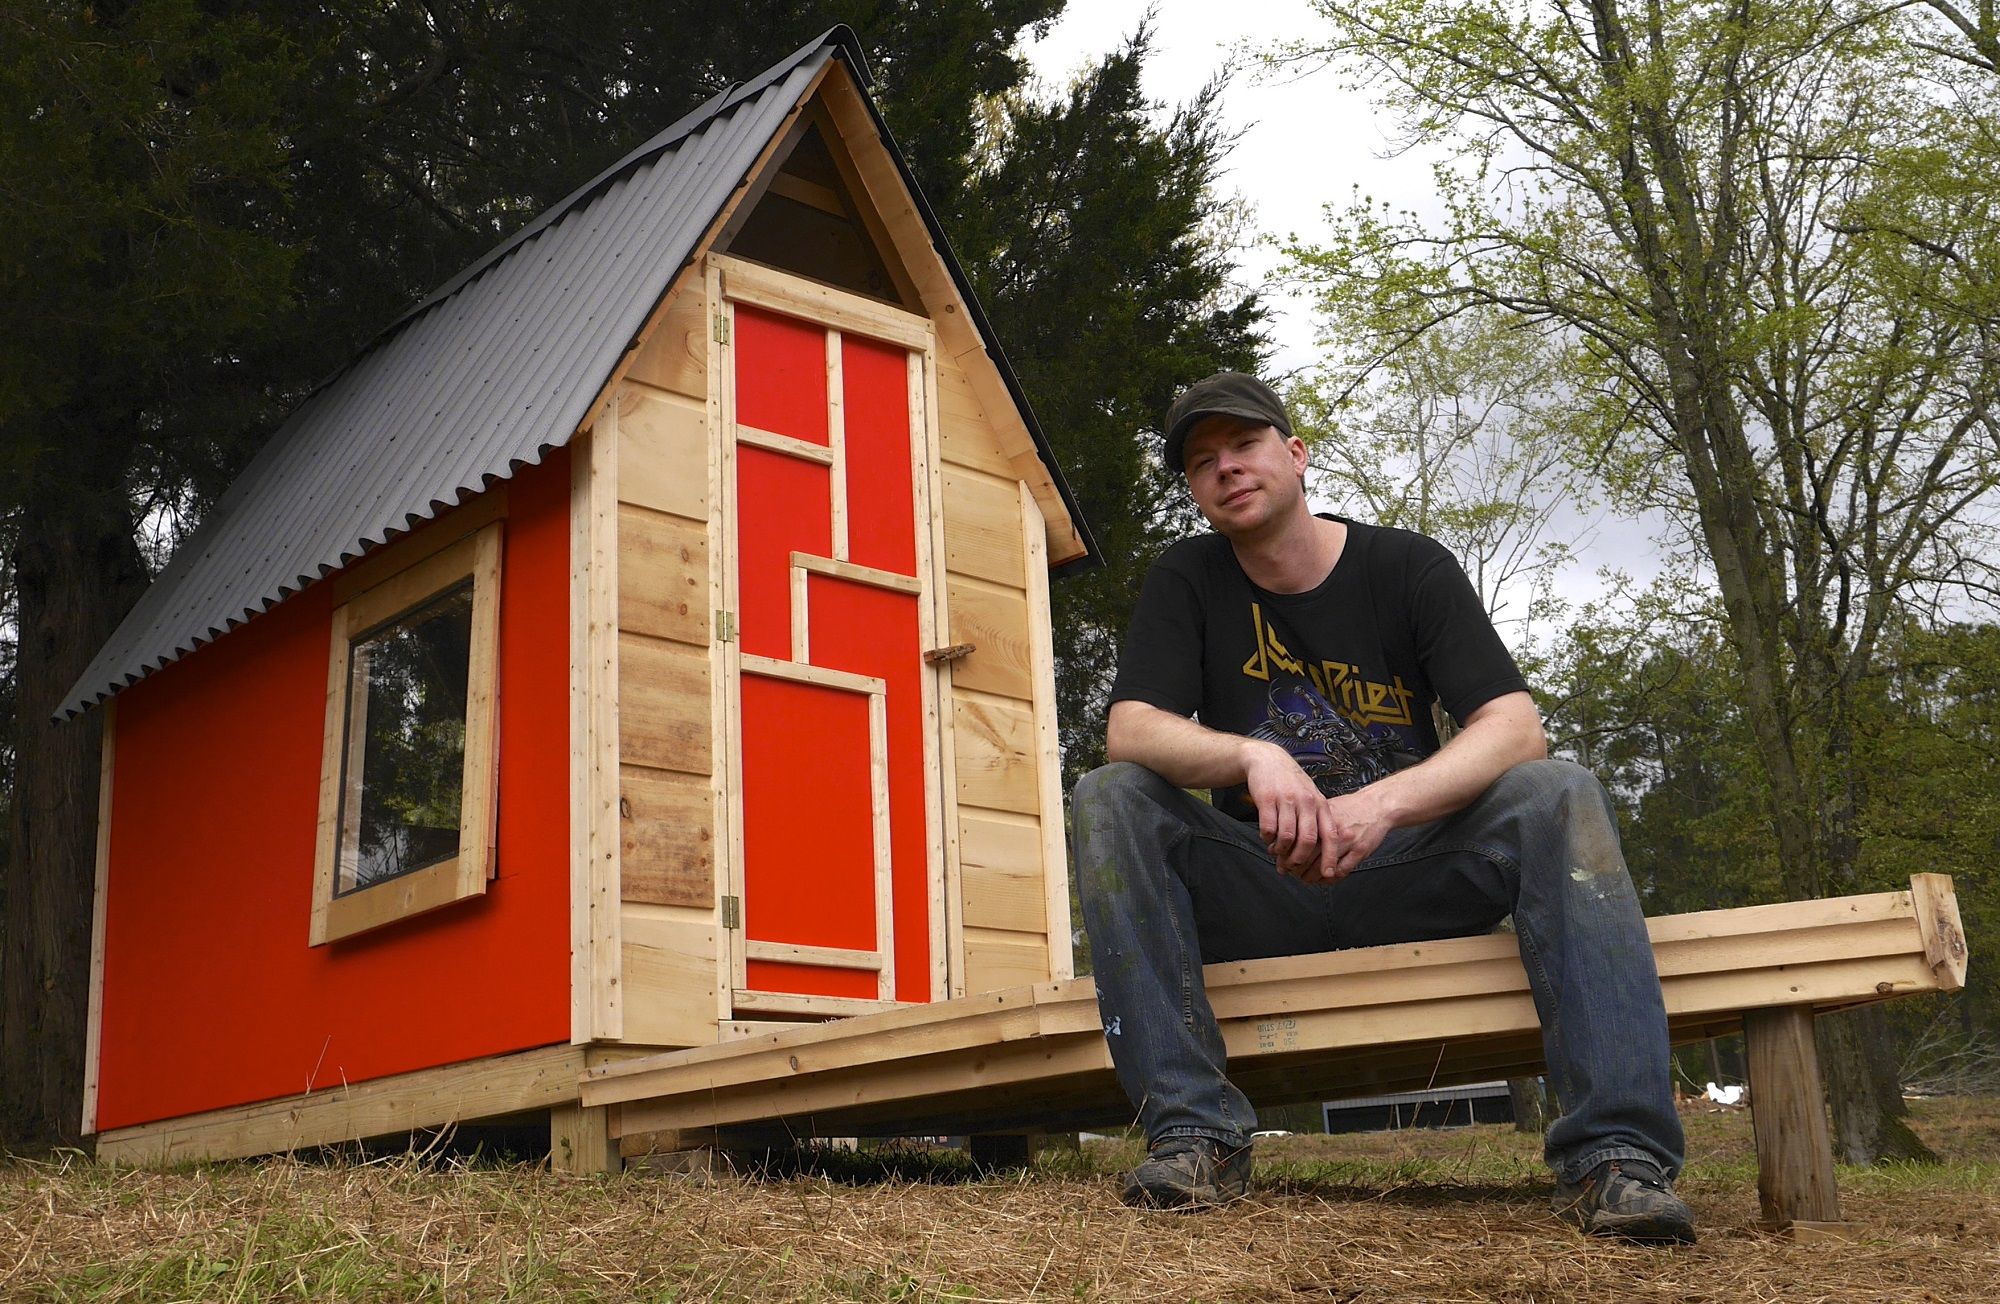 Tiny home q a microshelters author derek diedricksen for Online tiny house builder